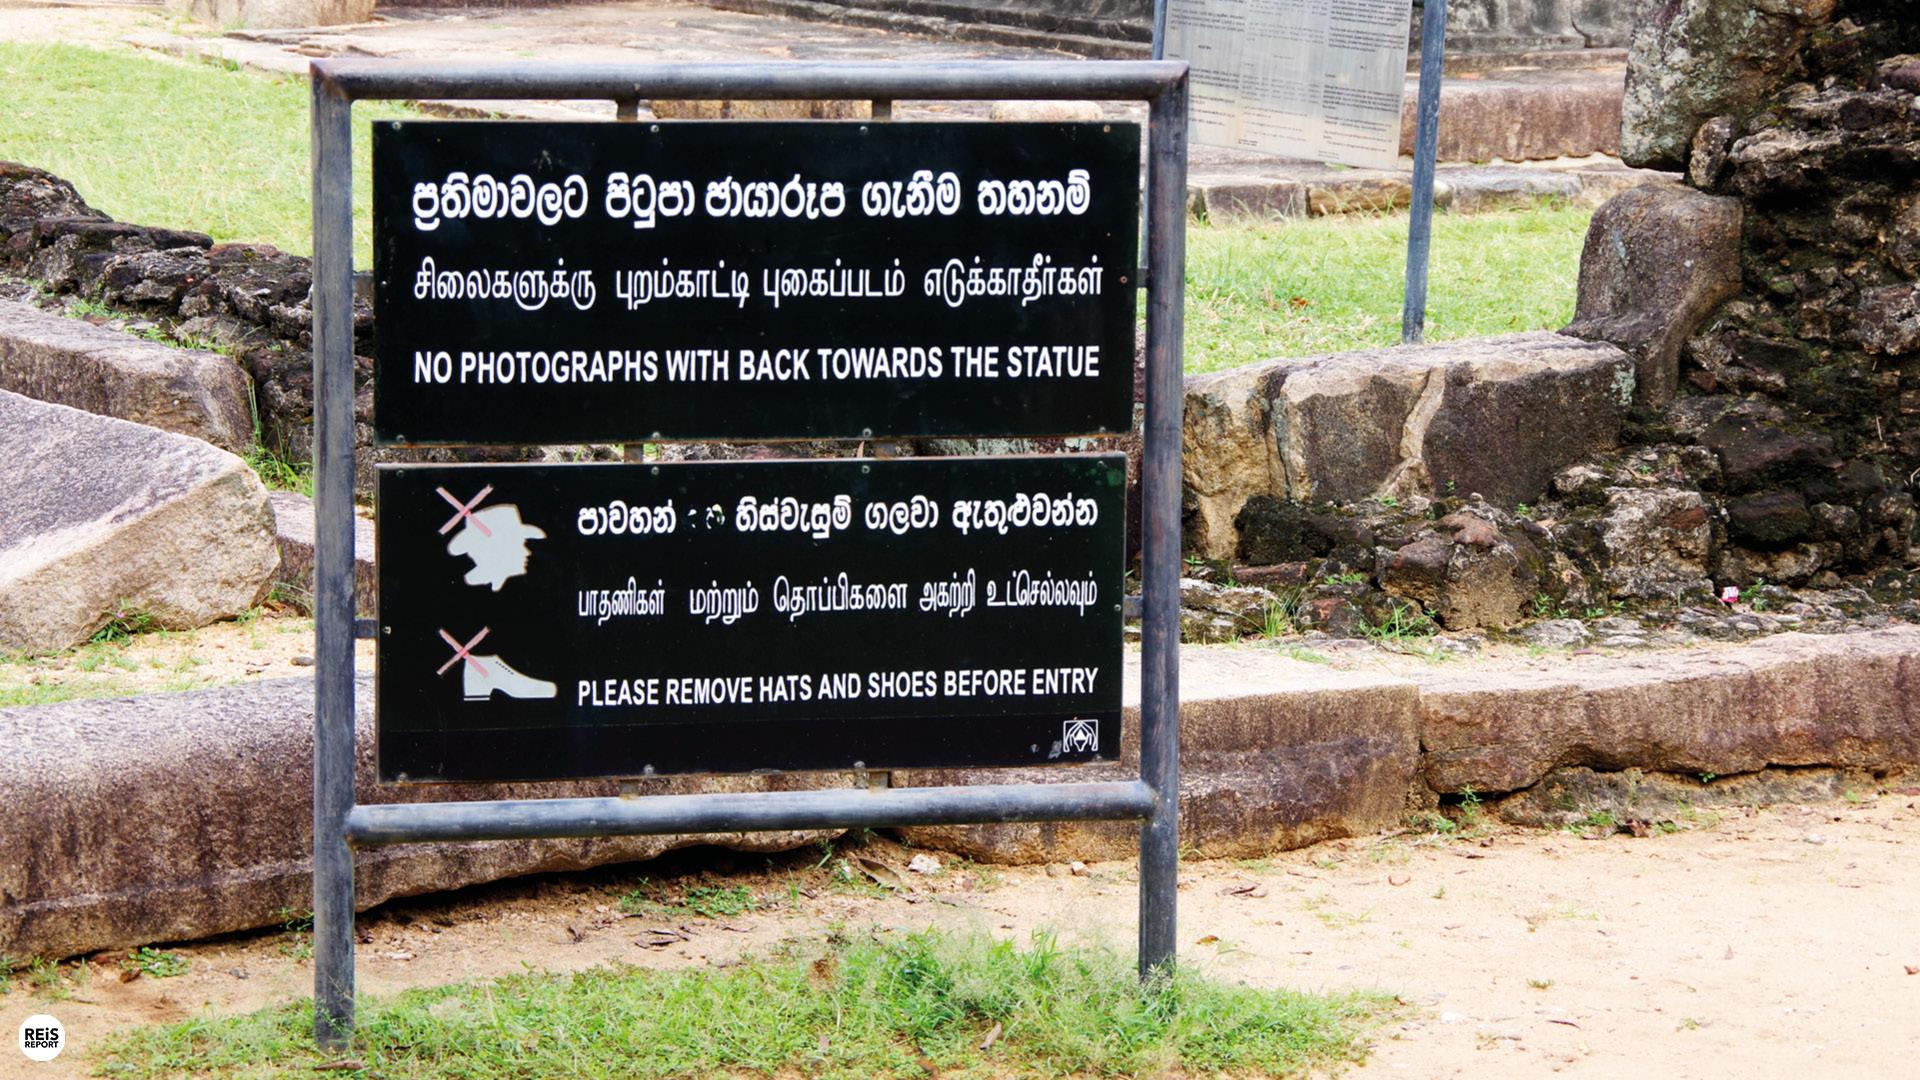 polonnaruwa regels